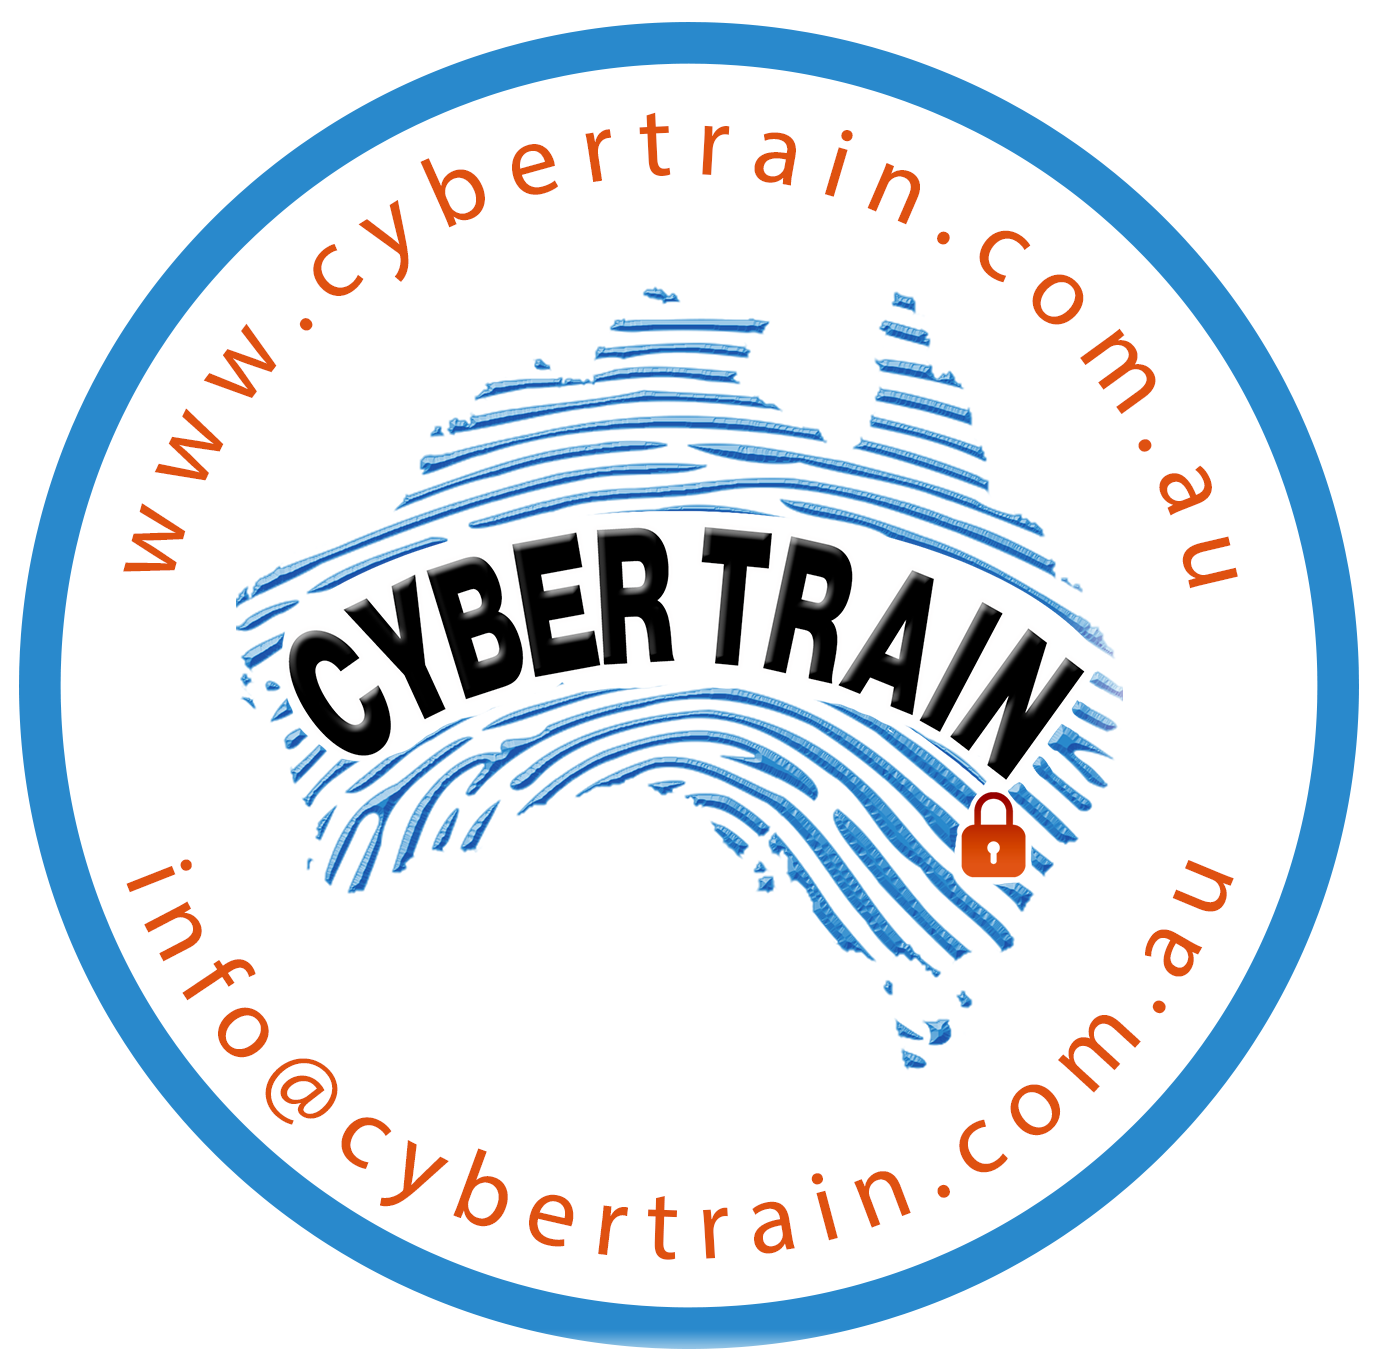 CyberTrain circular logo